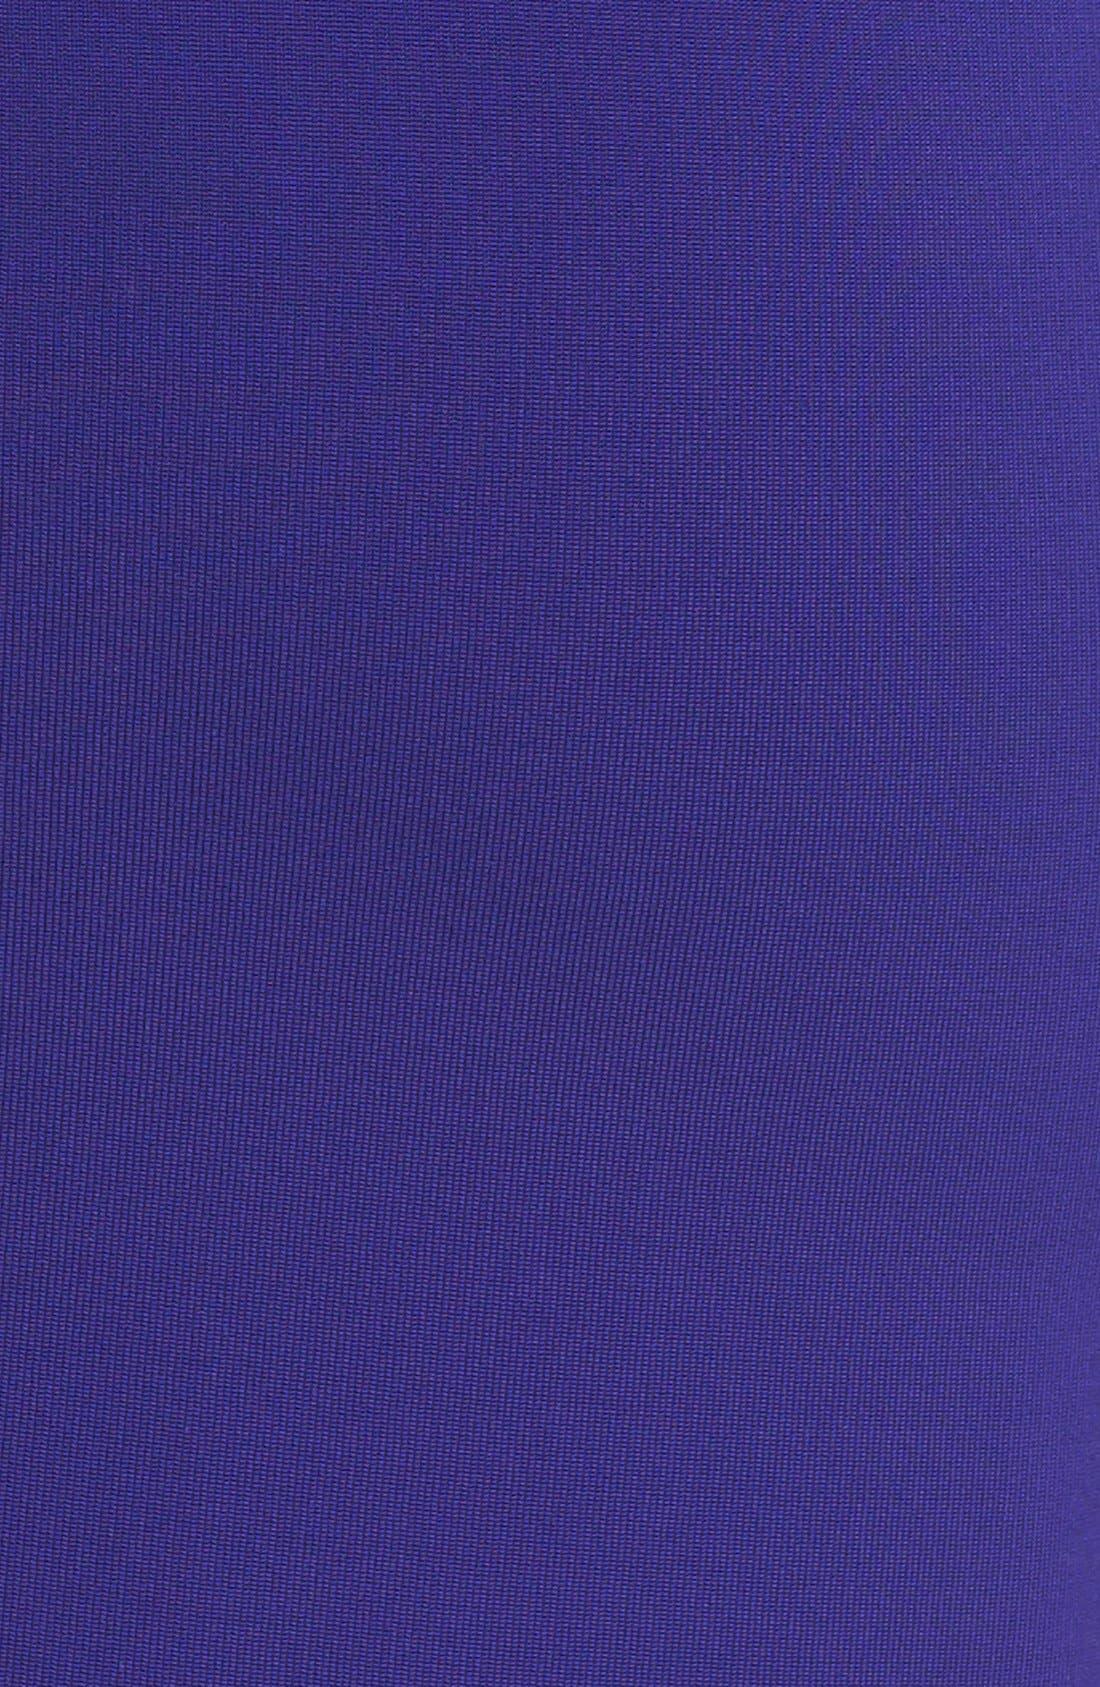 Alternate Image 3  - Victoria Beckham Plunging V-Neck Sheath Dress